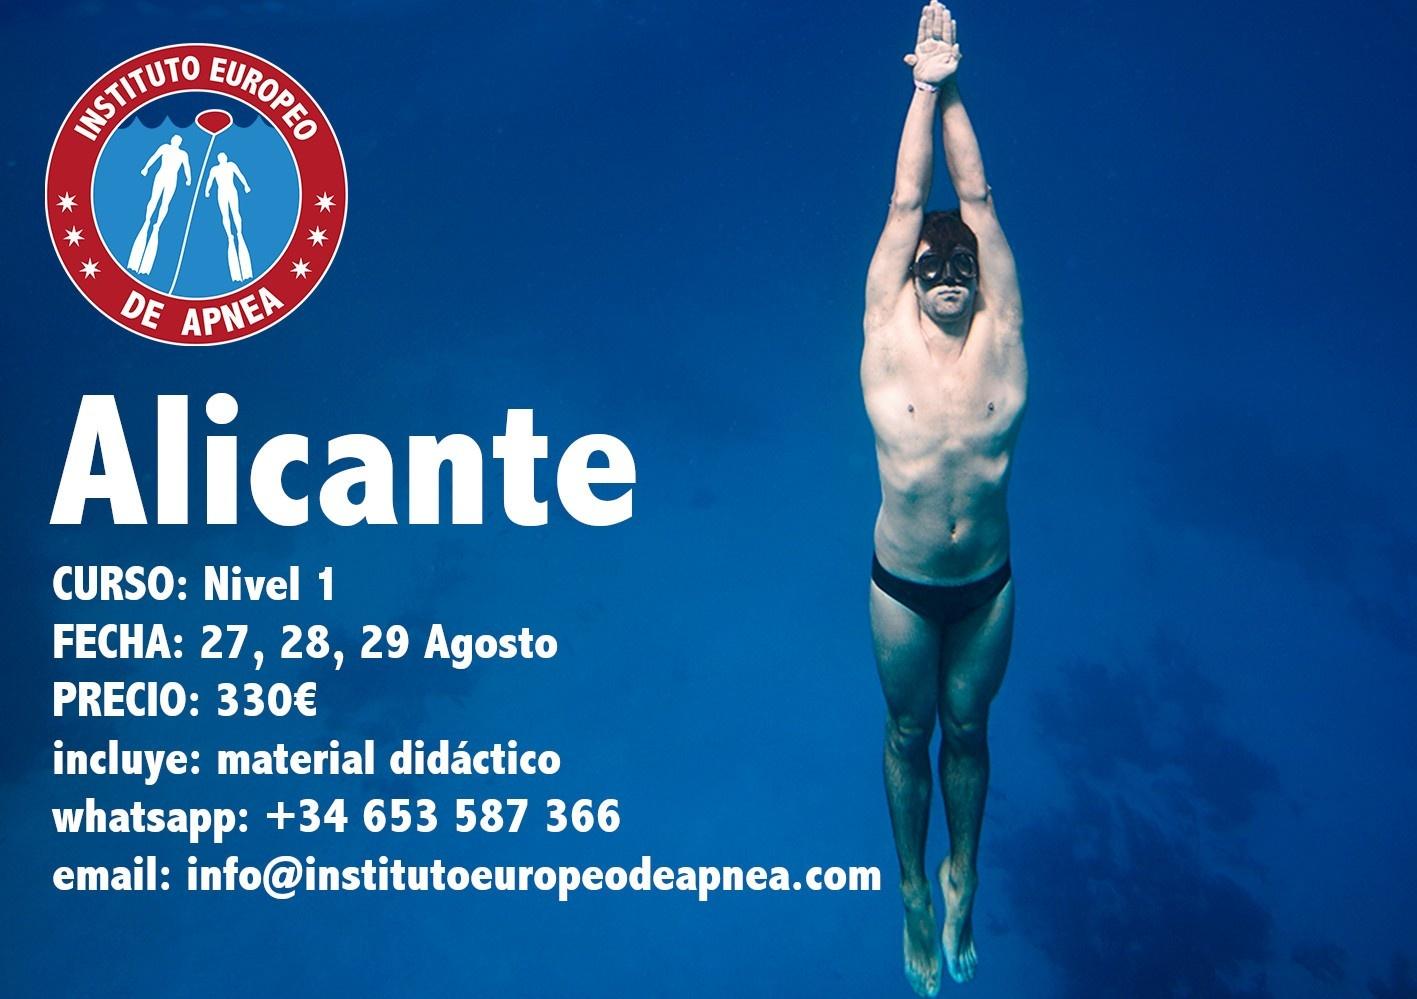 Curso de apnea en Alicante